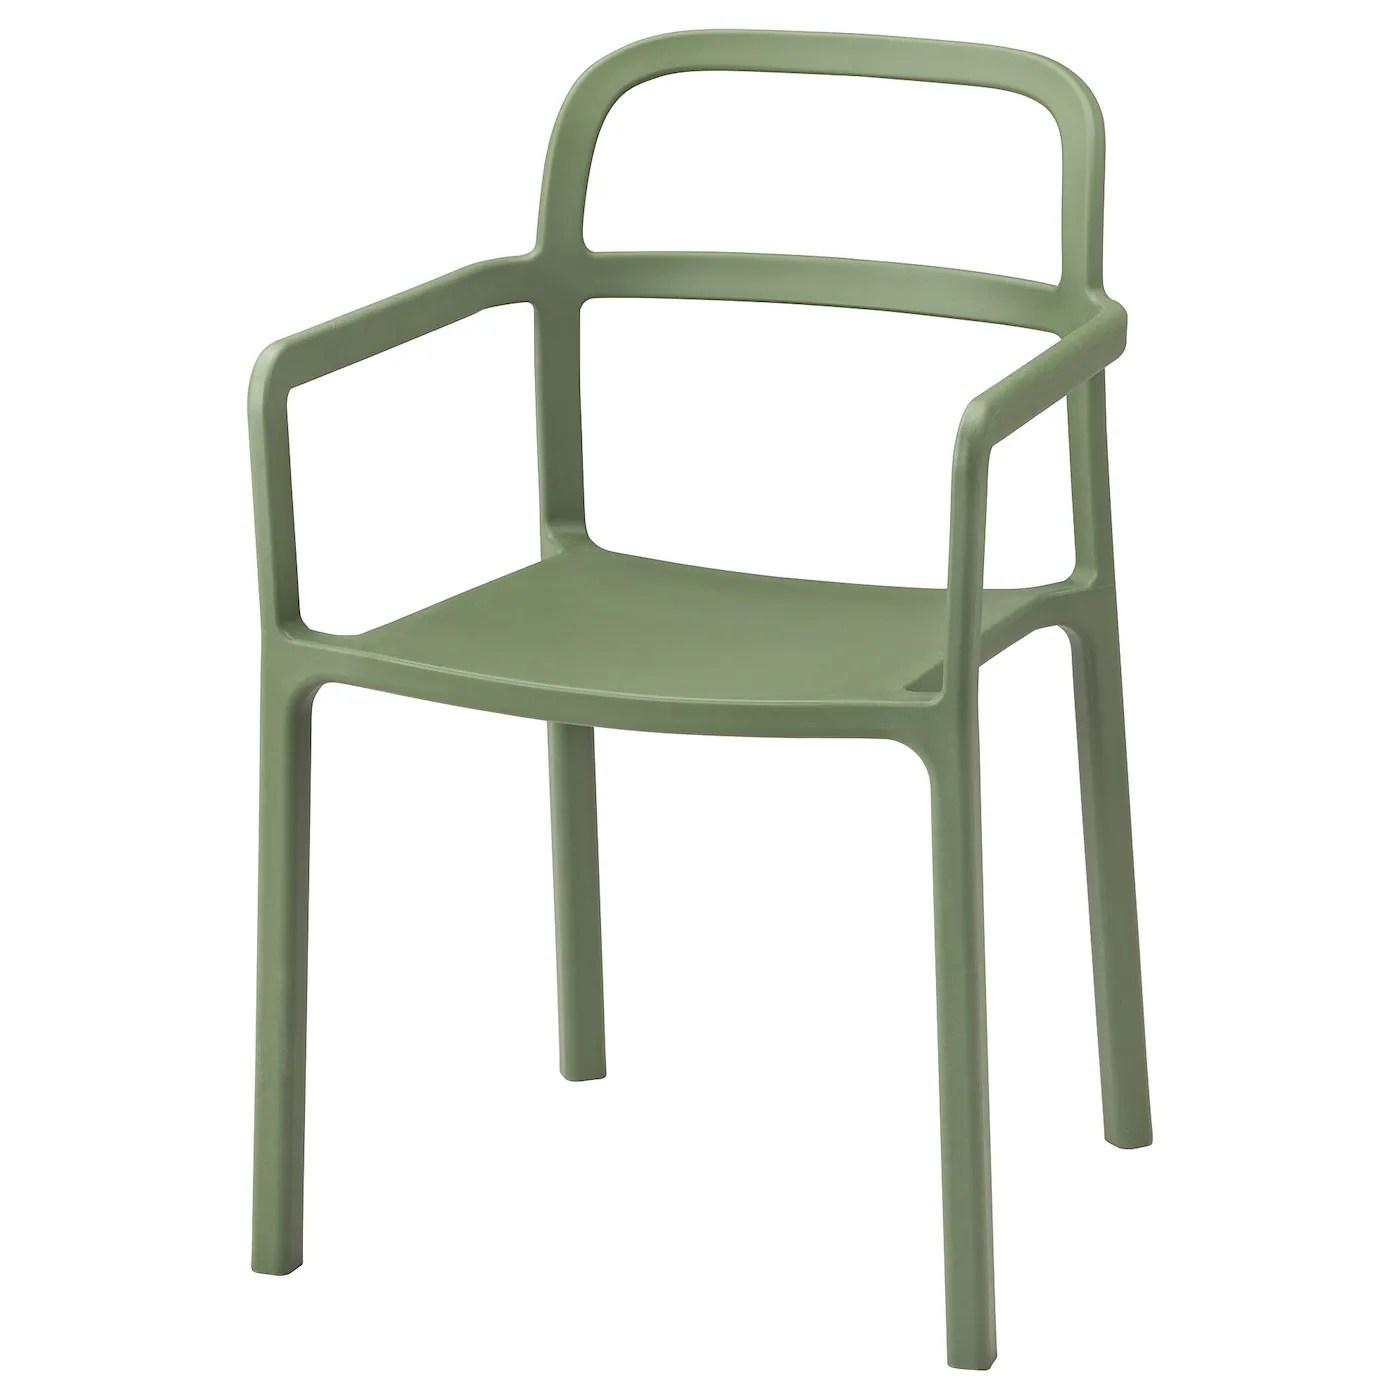 ypperlig chaise a accoudoirs int exterieur vert